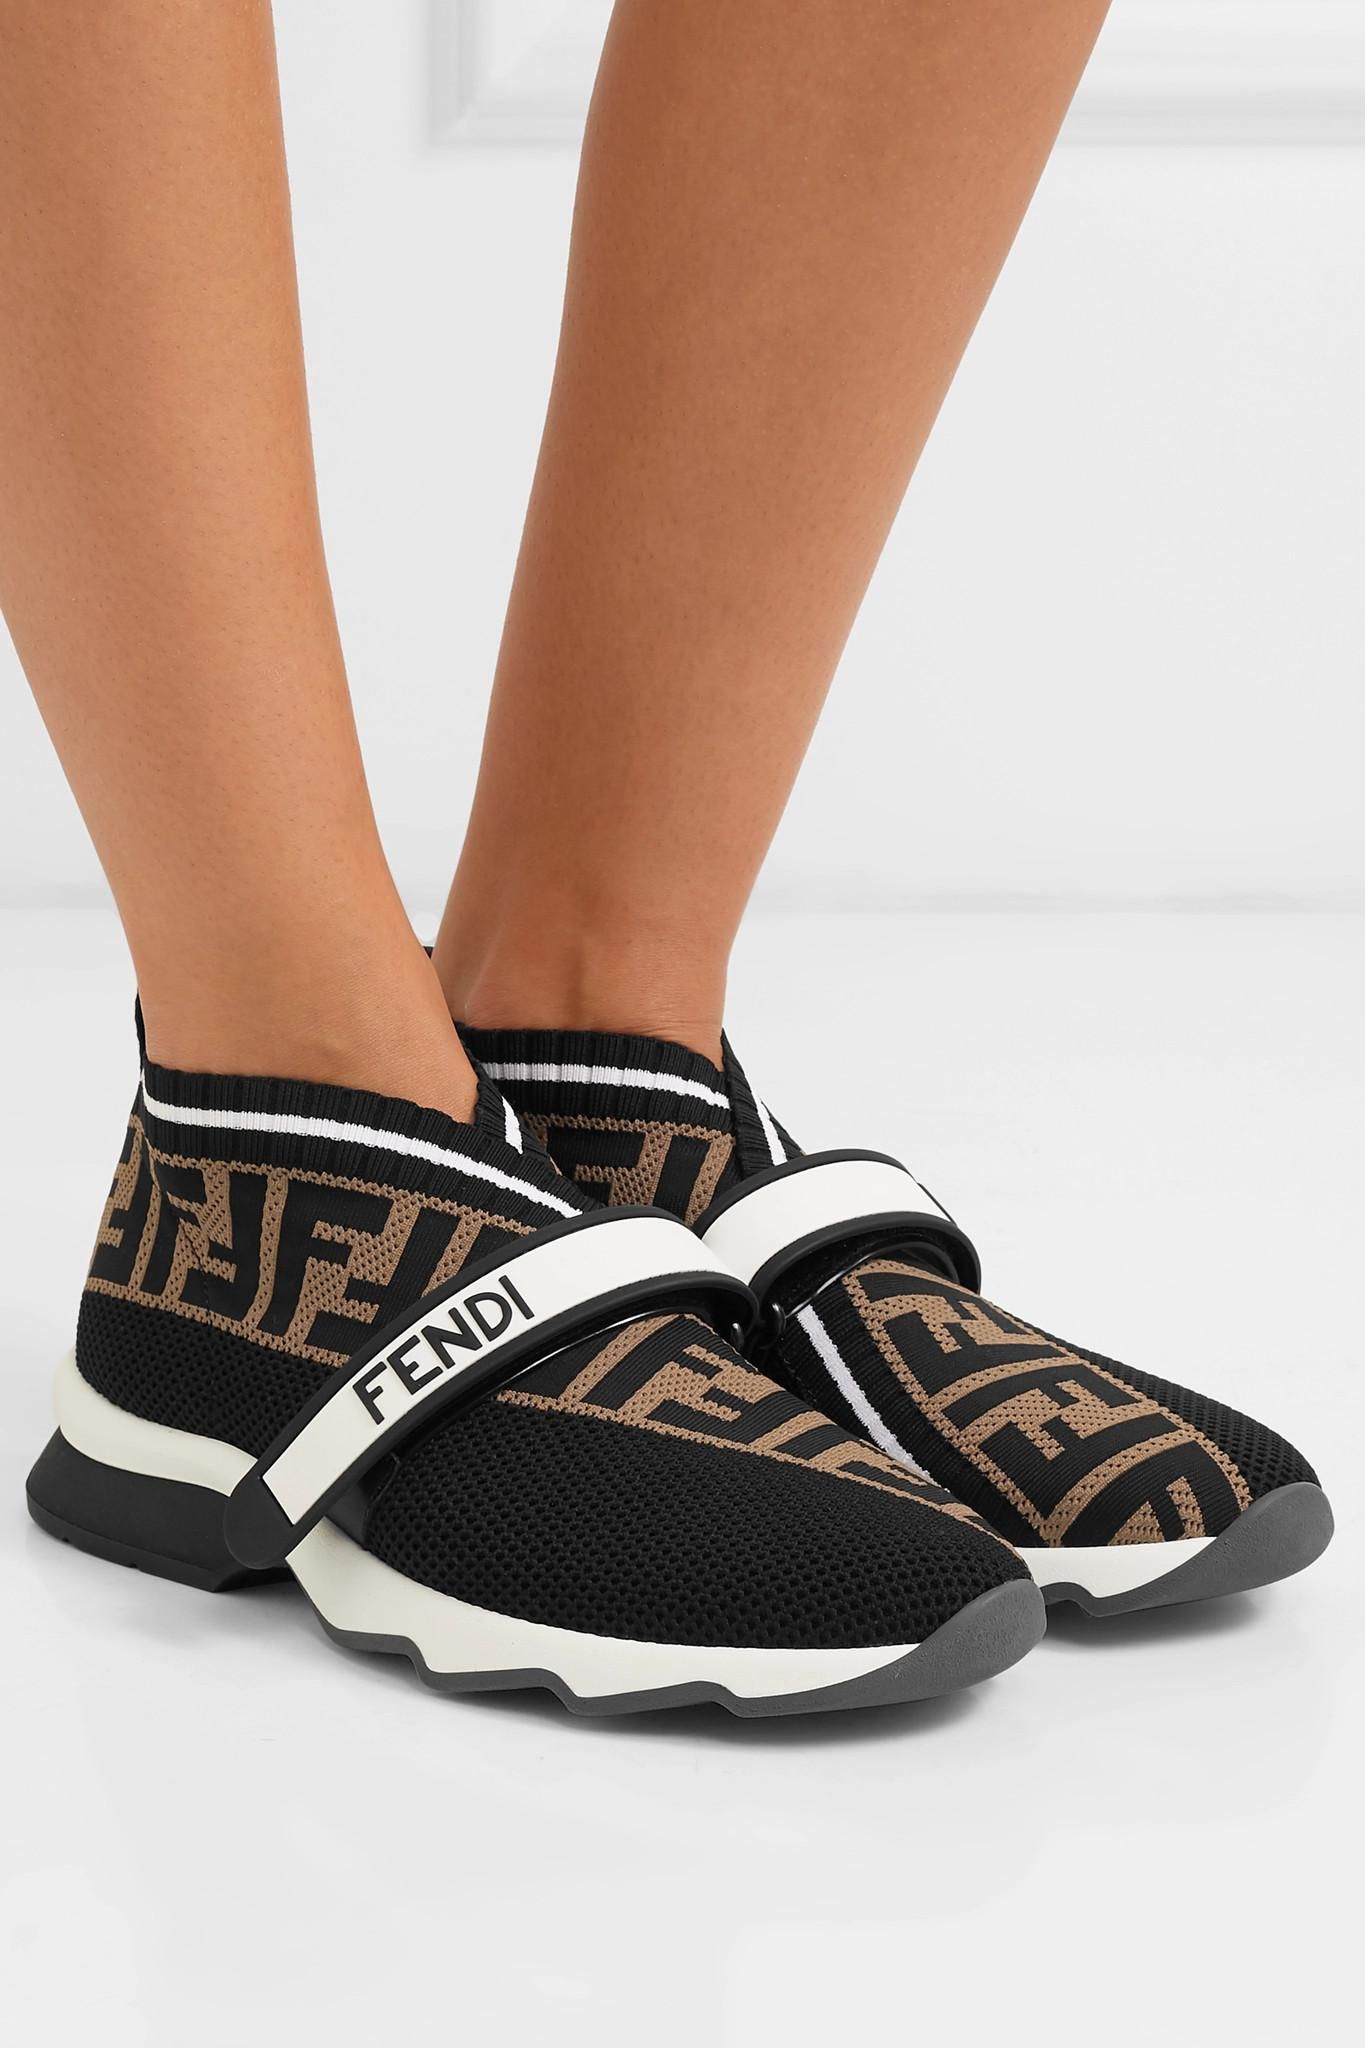 Fendi Ff Velcro Sock Trainers in Black